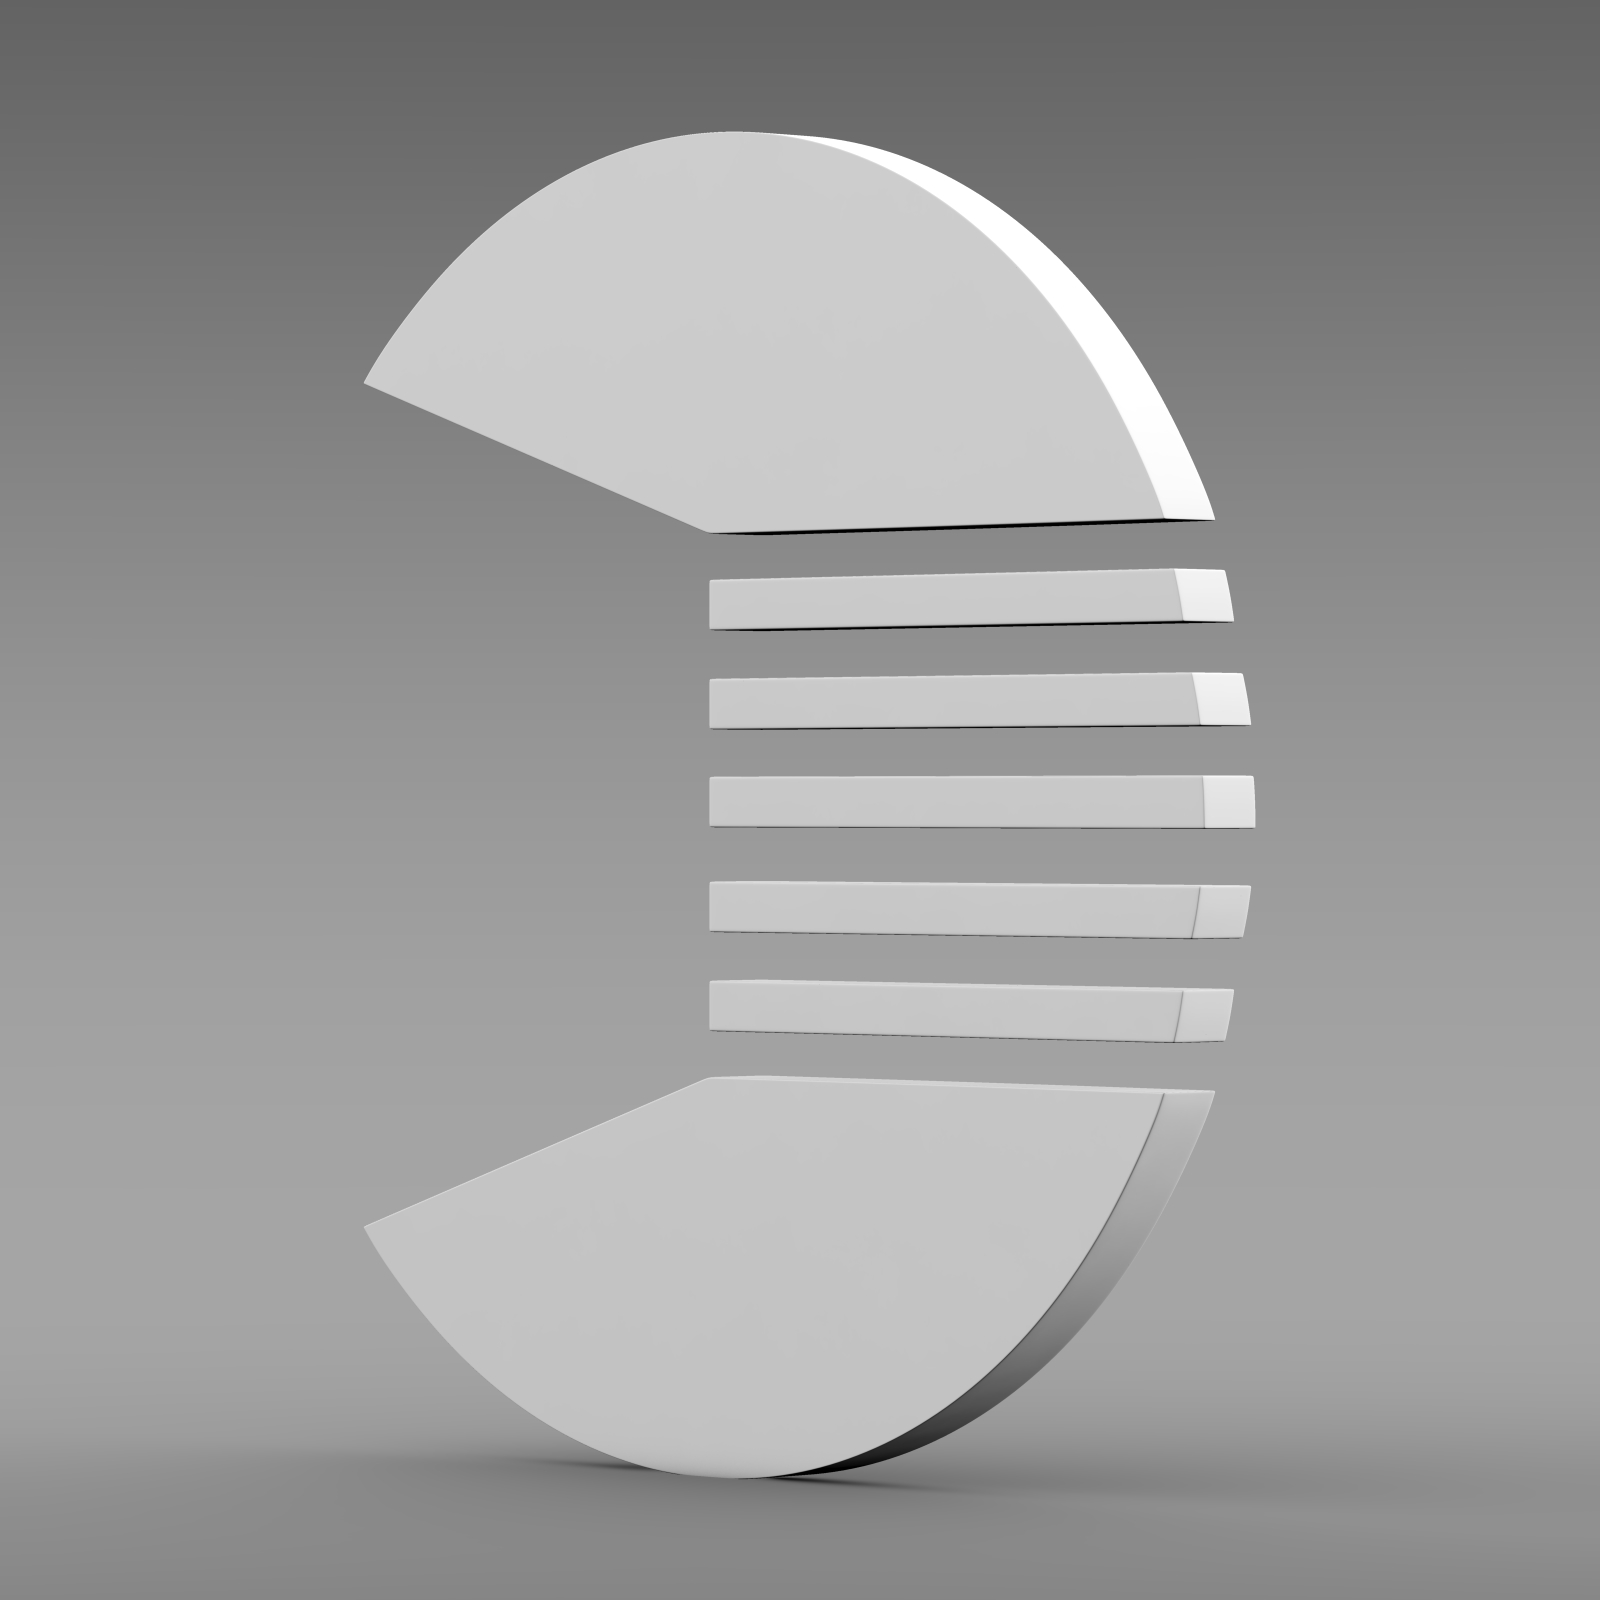 quant logo 3d model 3ds max fbx c4d lwo ma mb hrc xsi obj 213259